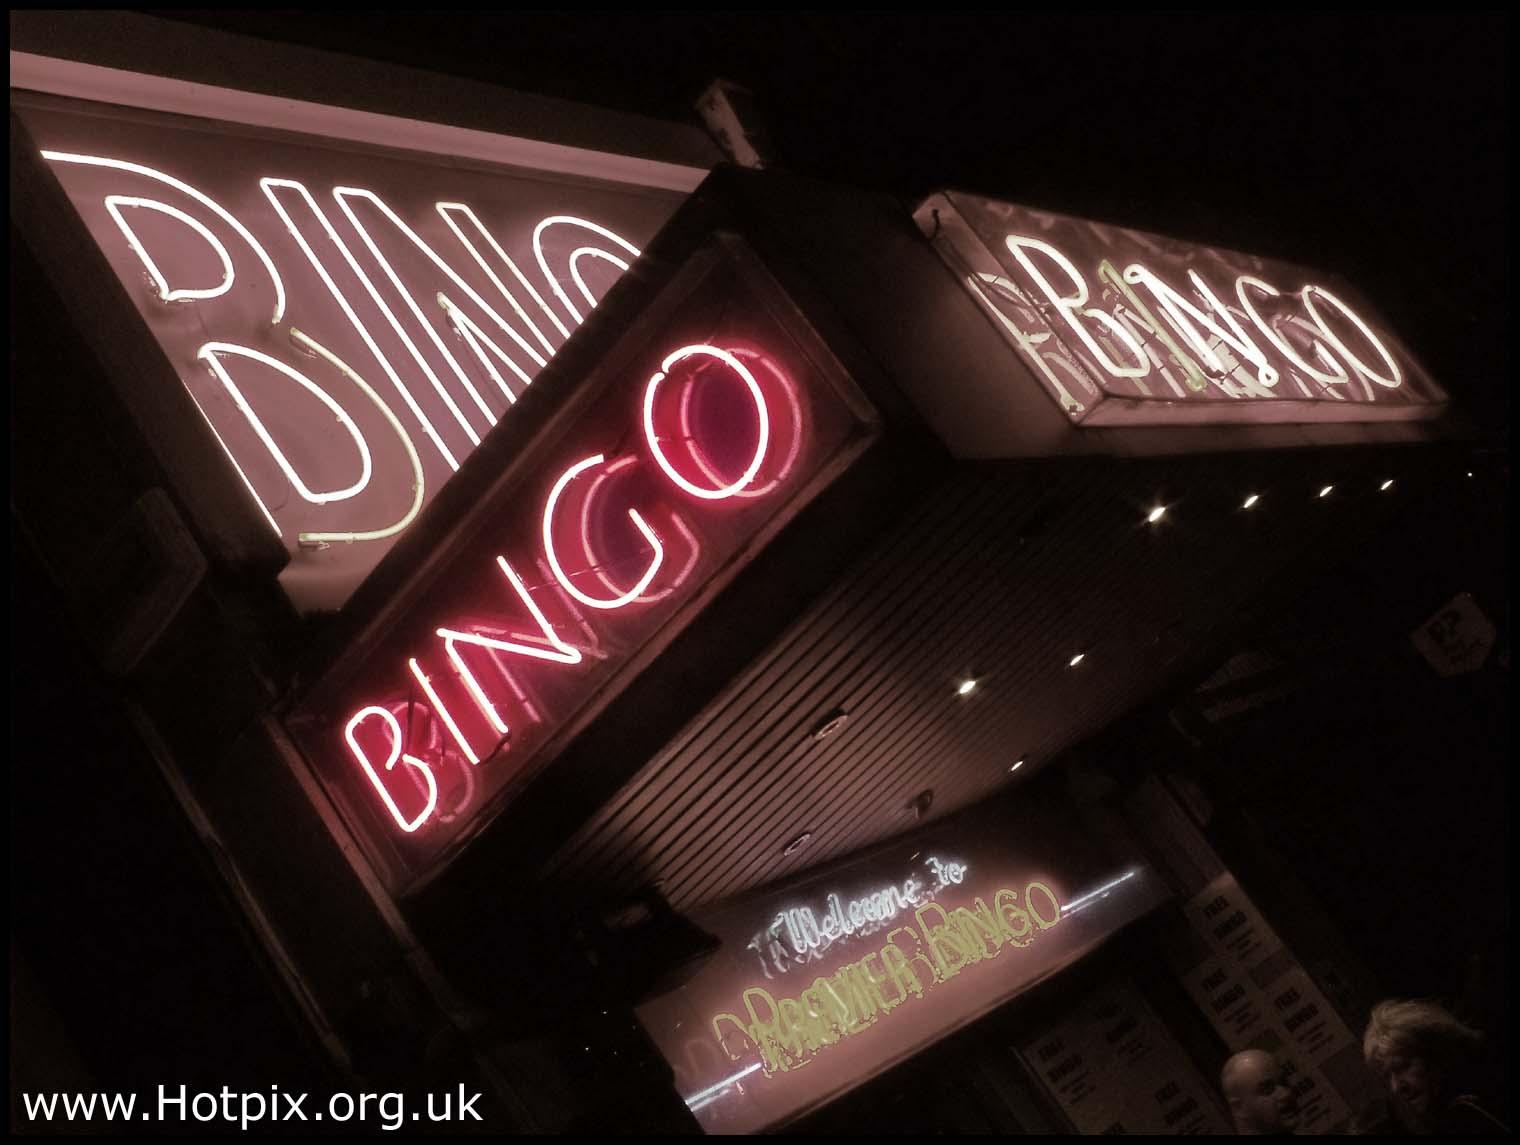 bingo,hall,night,tonysmith,tony,smith,hotpix,hot,pix,picks,hotpicks,hotpics,tonysmithhotpix,evening,red,music,edinburgh,lothian,lothians,scotland,UK,Premier,chambers,street,eh1,sepia,selective,color,colour,colores,august,2010,festival,fringe,tatoo,tattoo,dusk,gamble,gambling,seedy,Nicholson,St,canongate,GB,Europe,edinbrugh,ipod,Edinburg,#tonysmithotpix,edimburgh